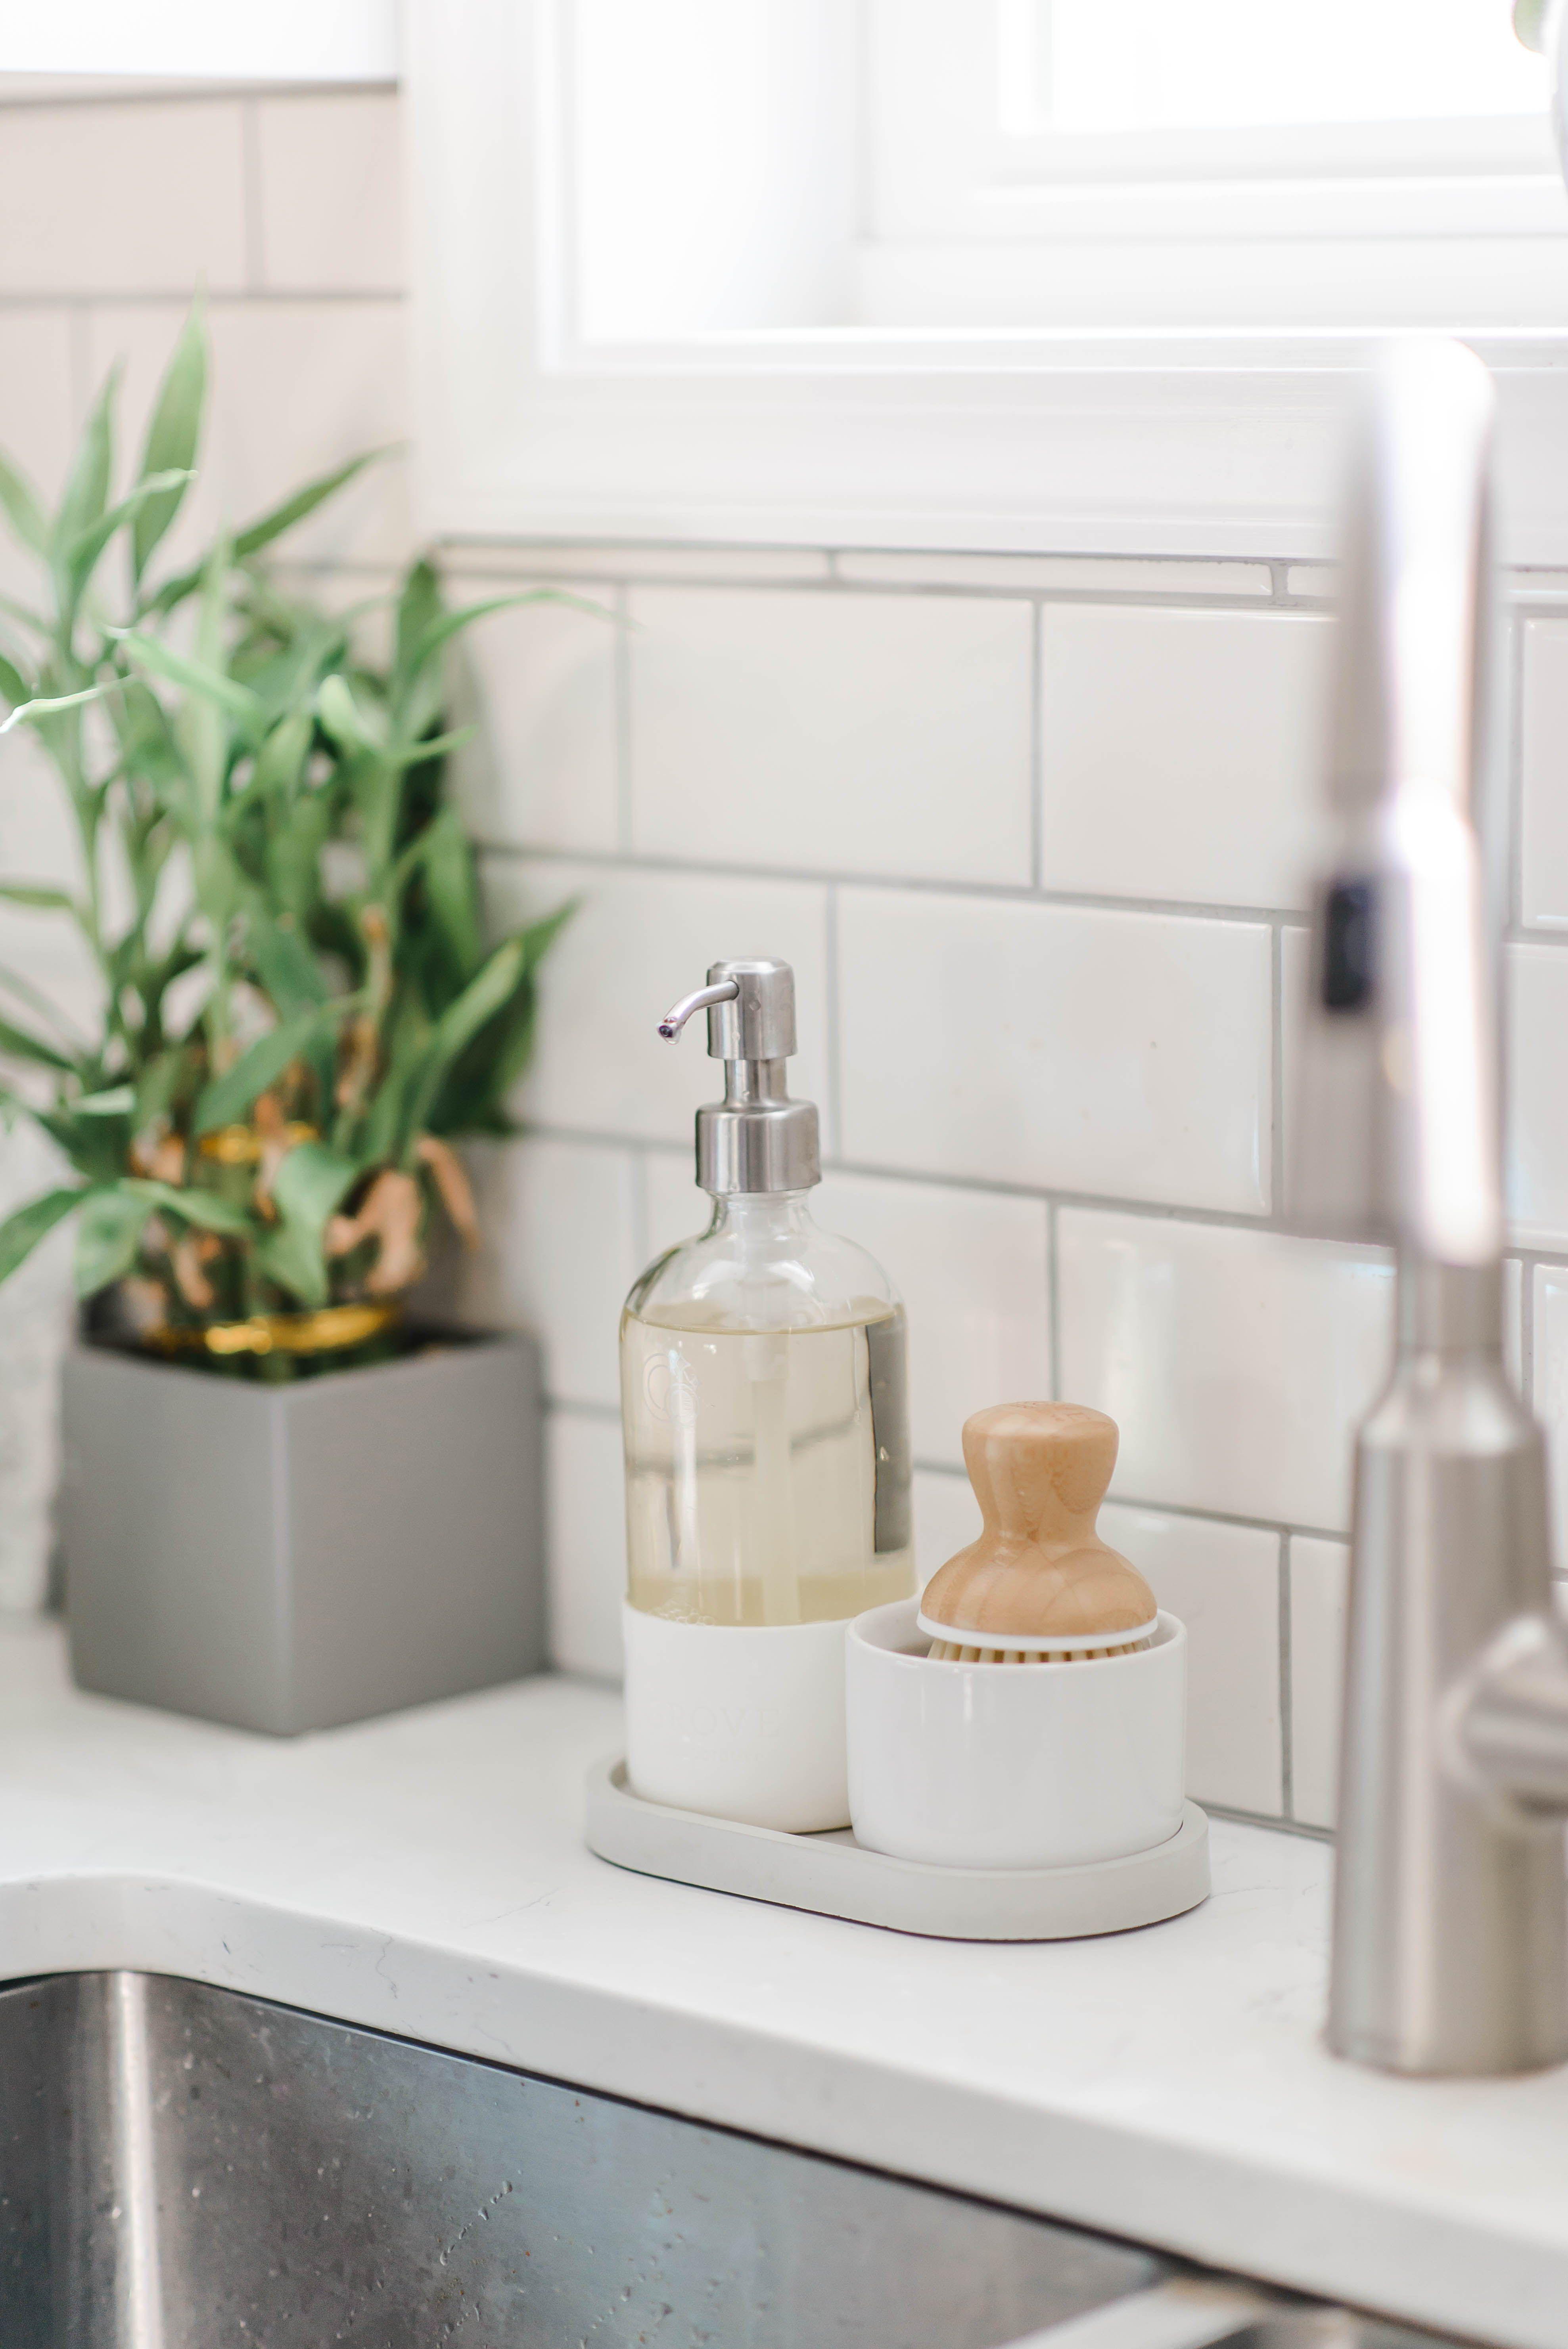 Kitchen Soap Dispenser Tray Soap Bottle Tray Kitchen Sink Caddy Dish Soap Organizer In 2021 Kitchen Soap Dispenser Kitchen Soap Kitchen Sink Decor